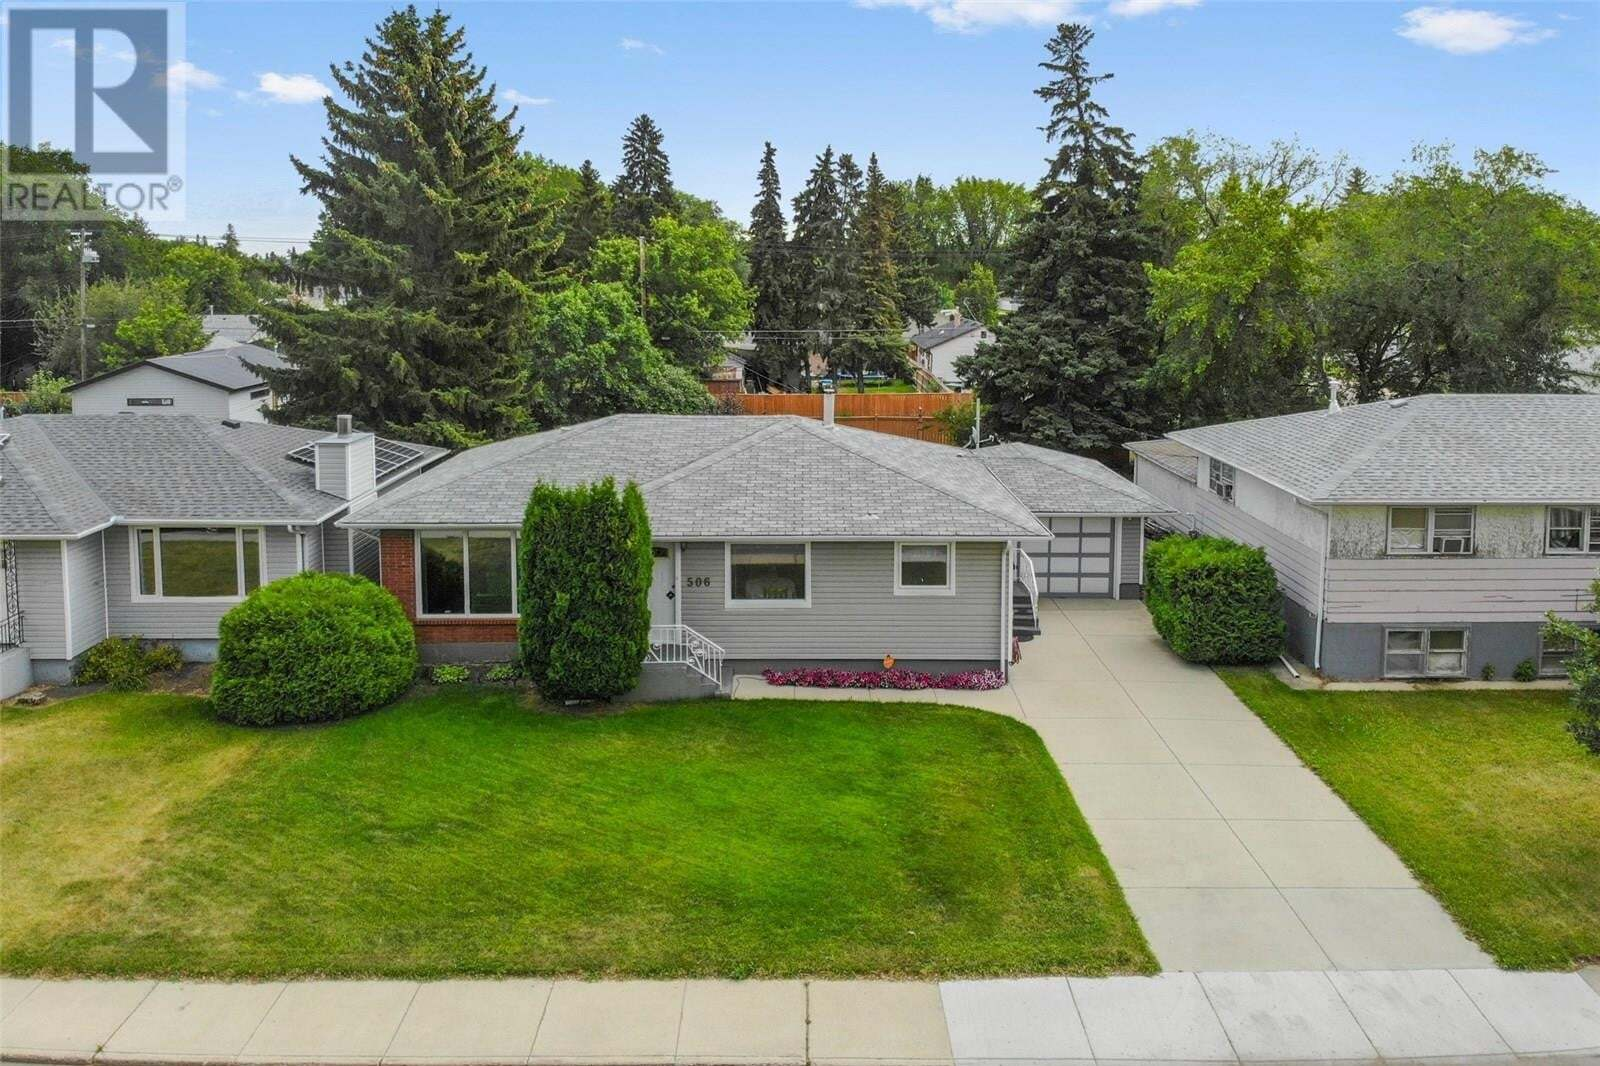 House for sale at 506 T Ave N Saskatoon Saskatchewan - MLS: SK818650